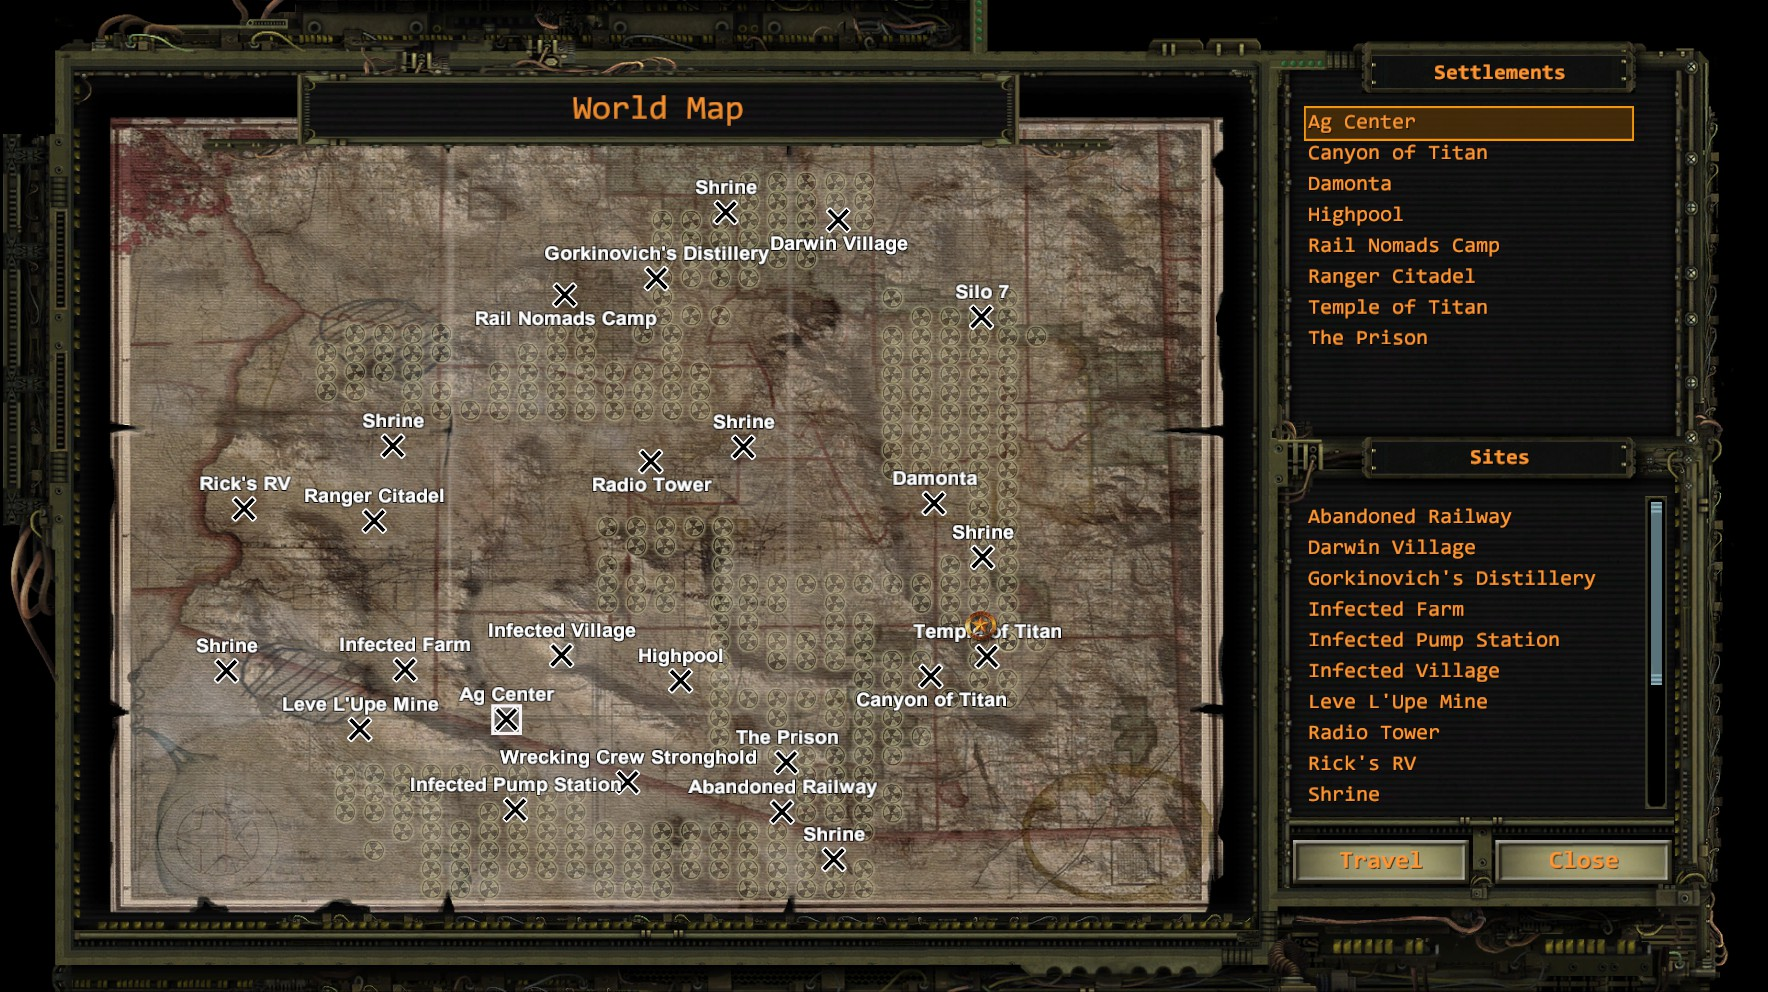 Wasteland 2 Arizona Map Steam Community :: Screenshot :: Wasteland 2 Arizona Map